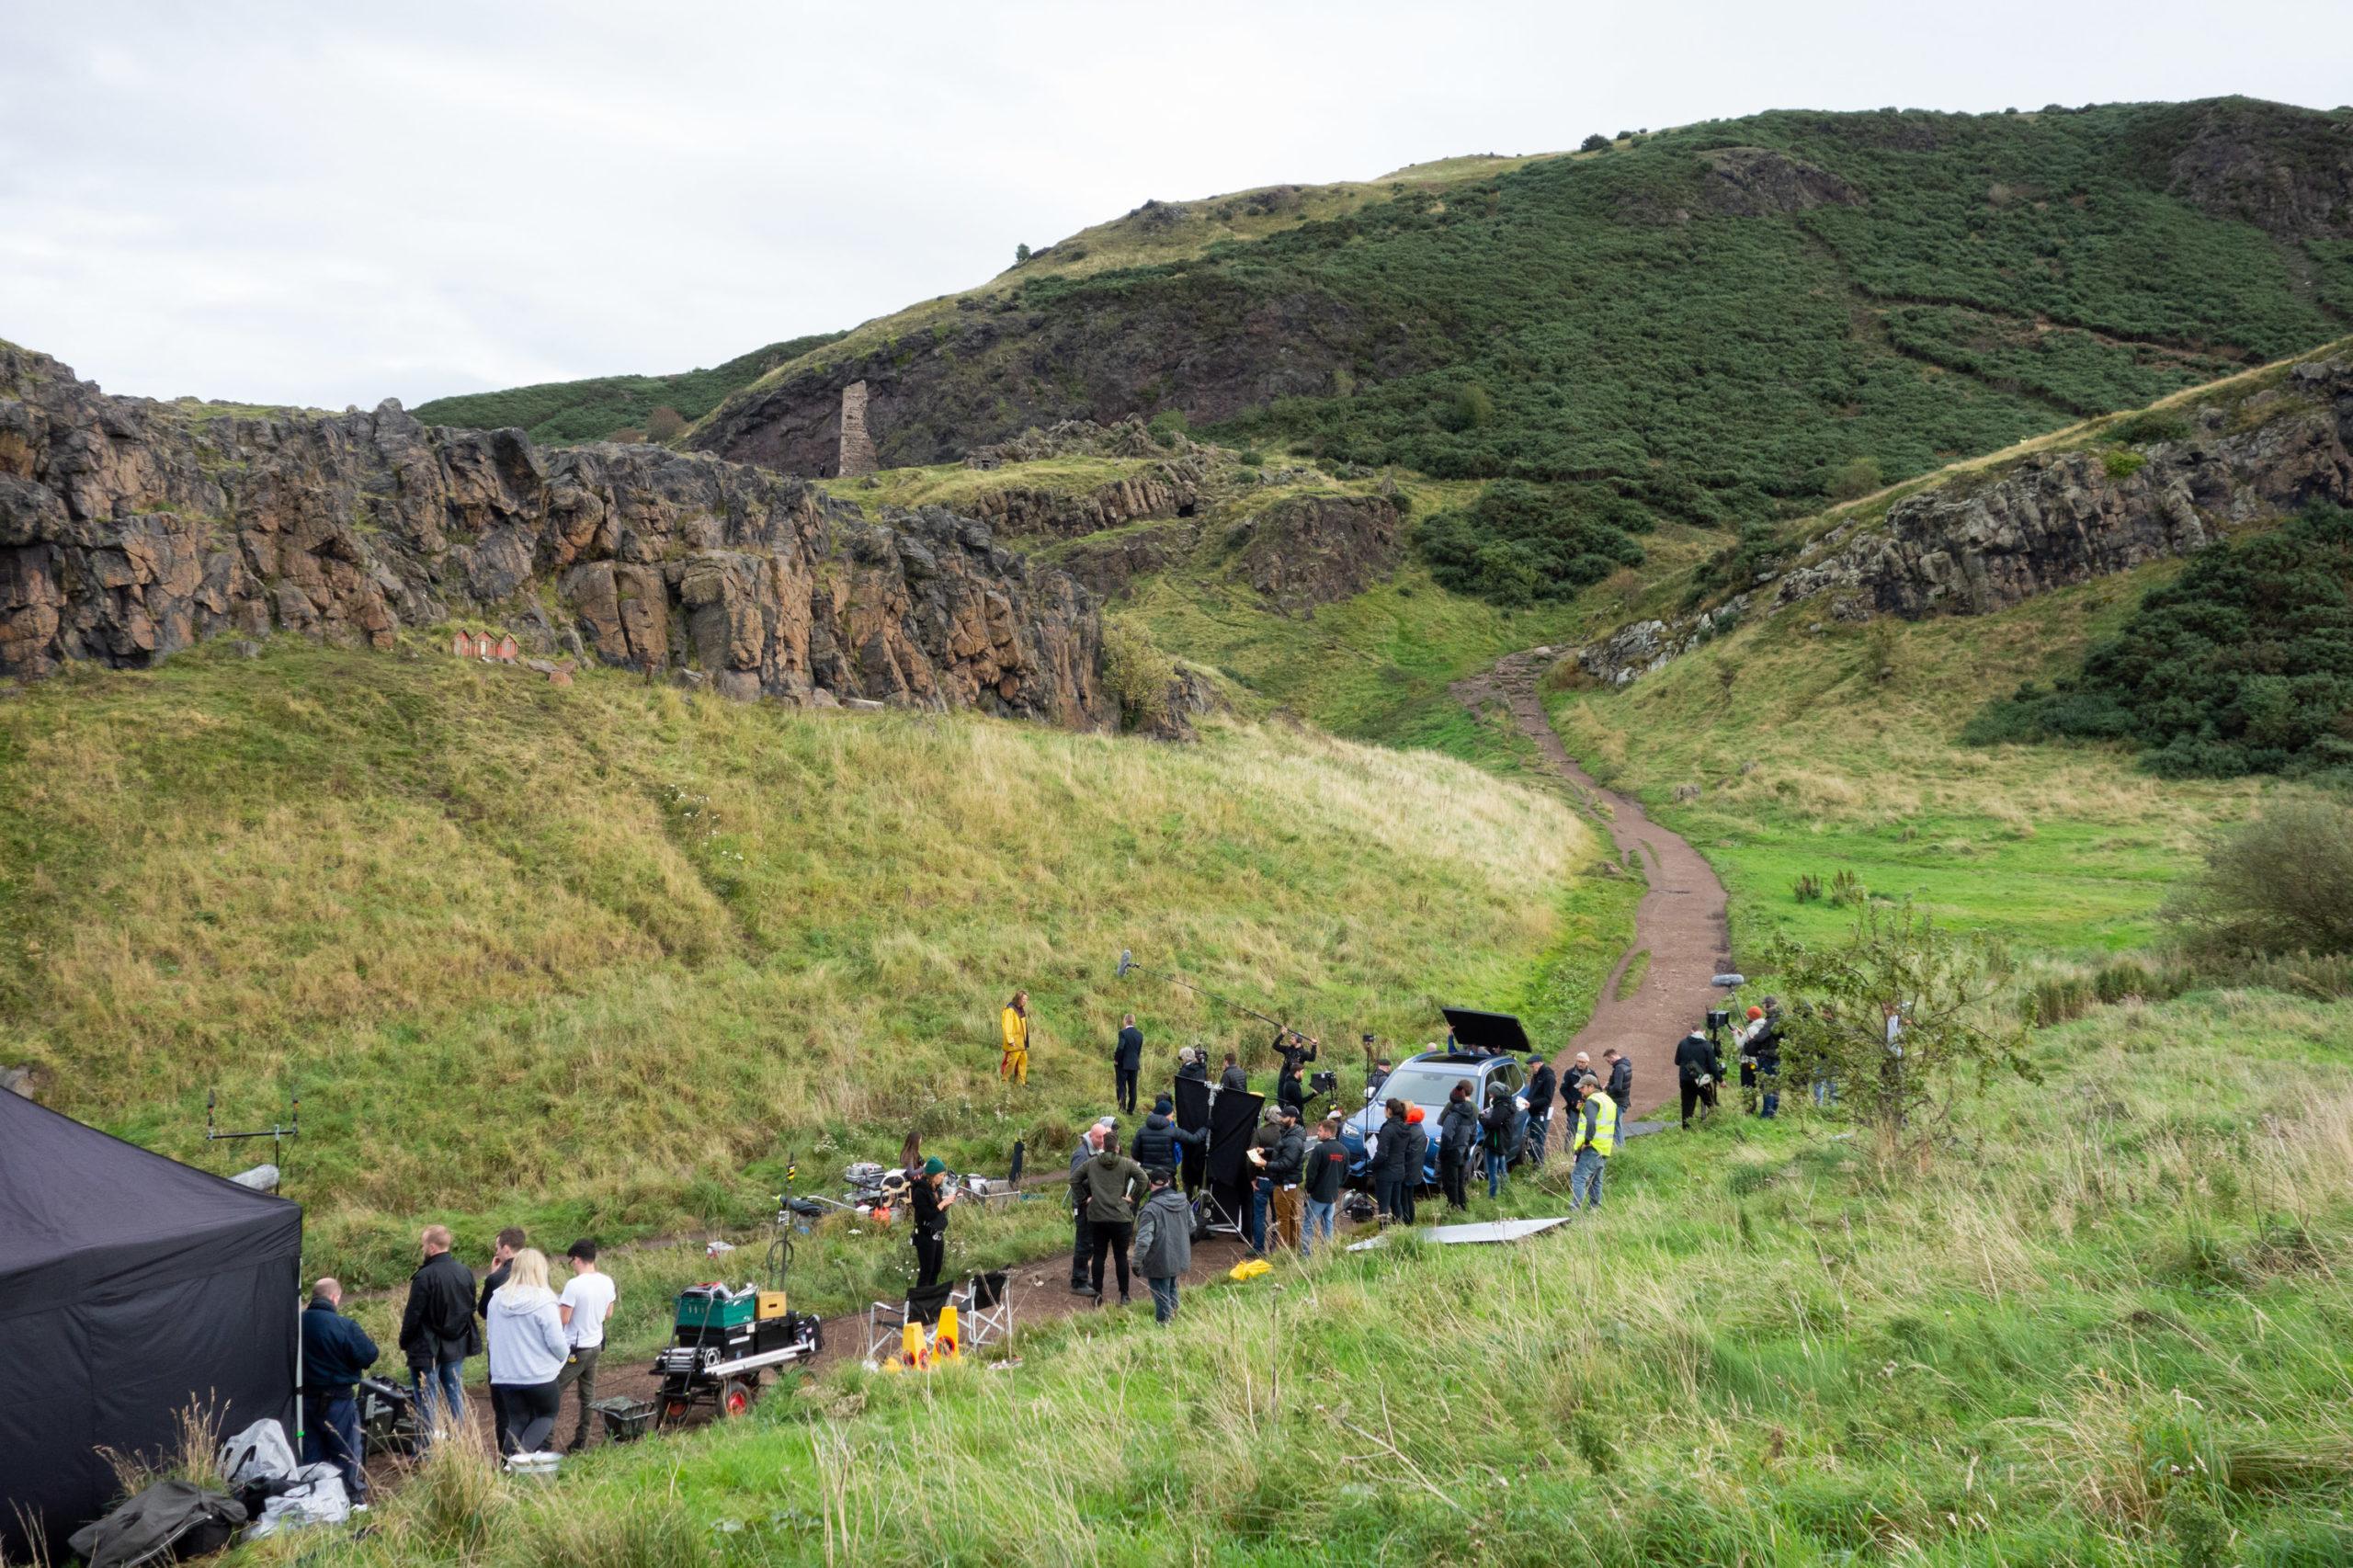 crowd of people on a hillside